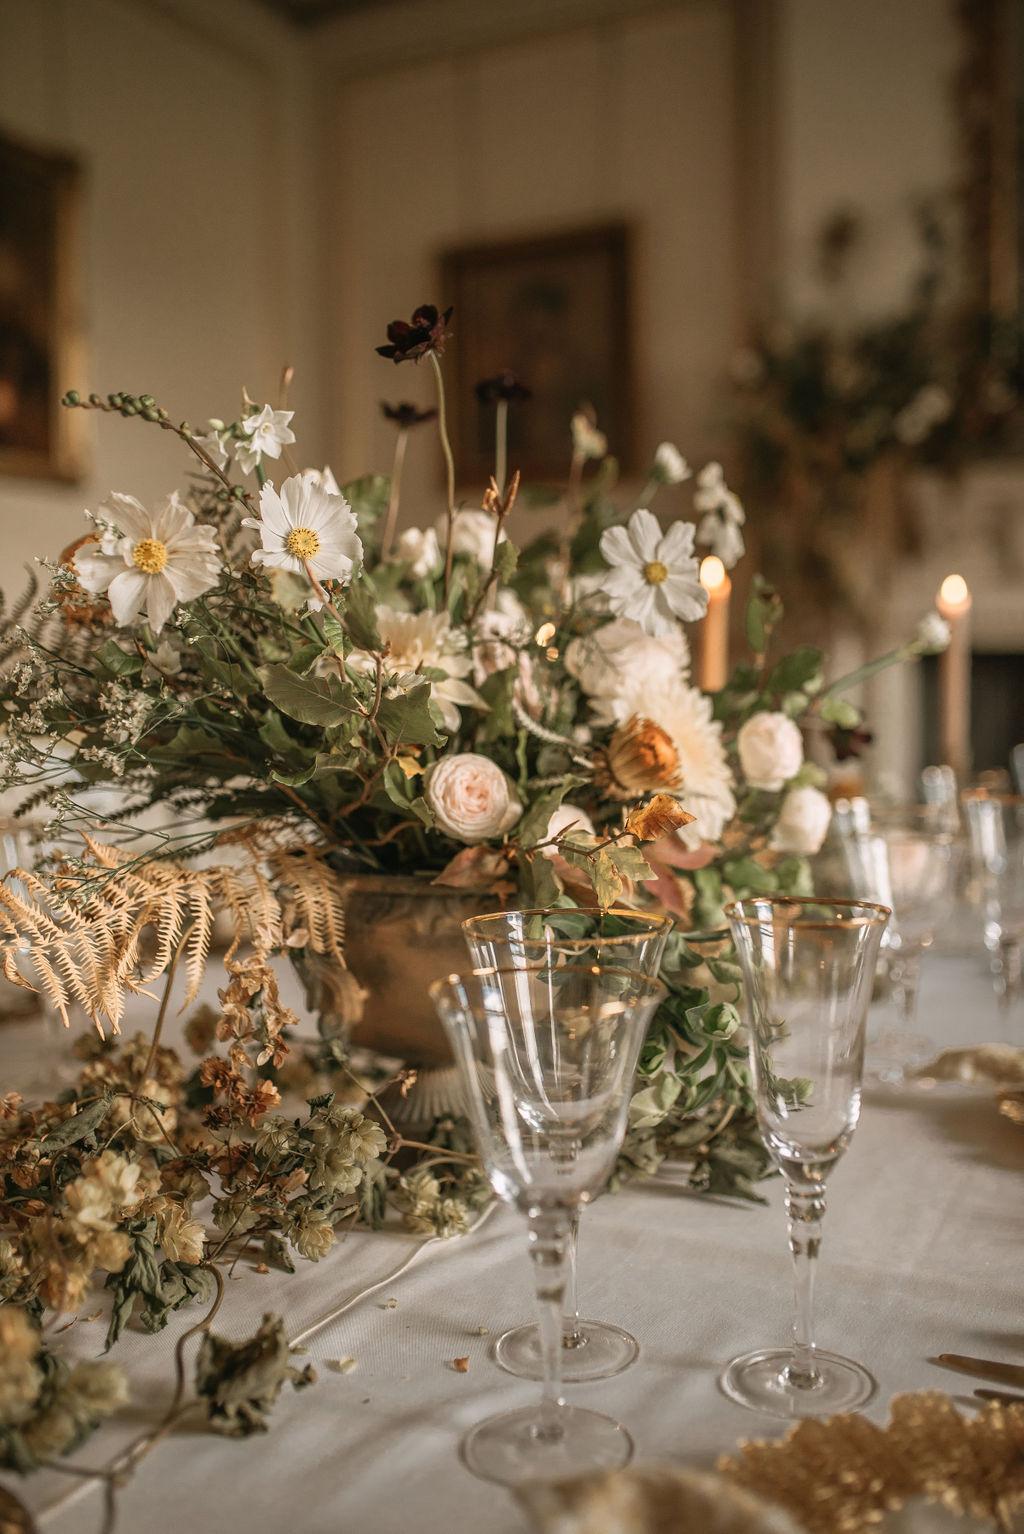 Dried Flowers Wedding Ideas For A Table Setting Floral Arrangement Crimson Letters